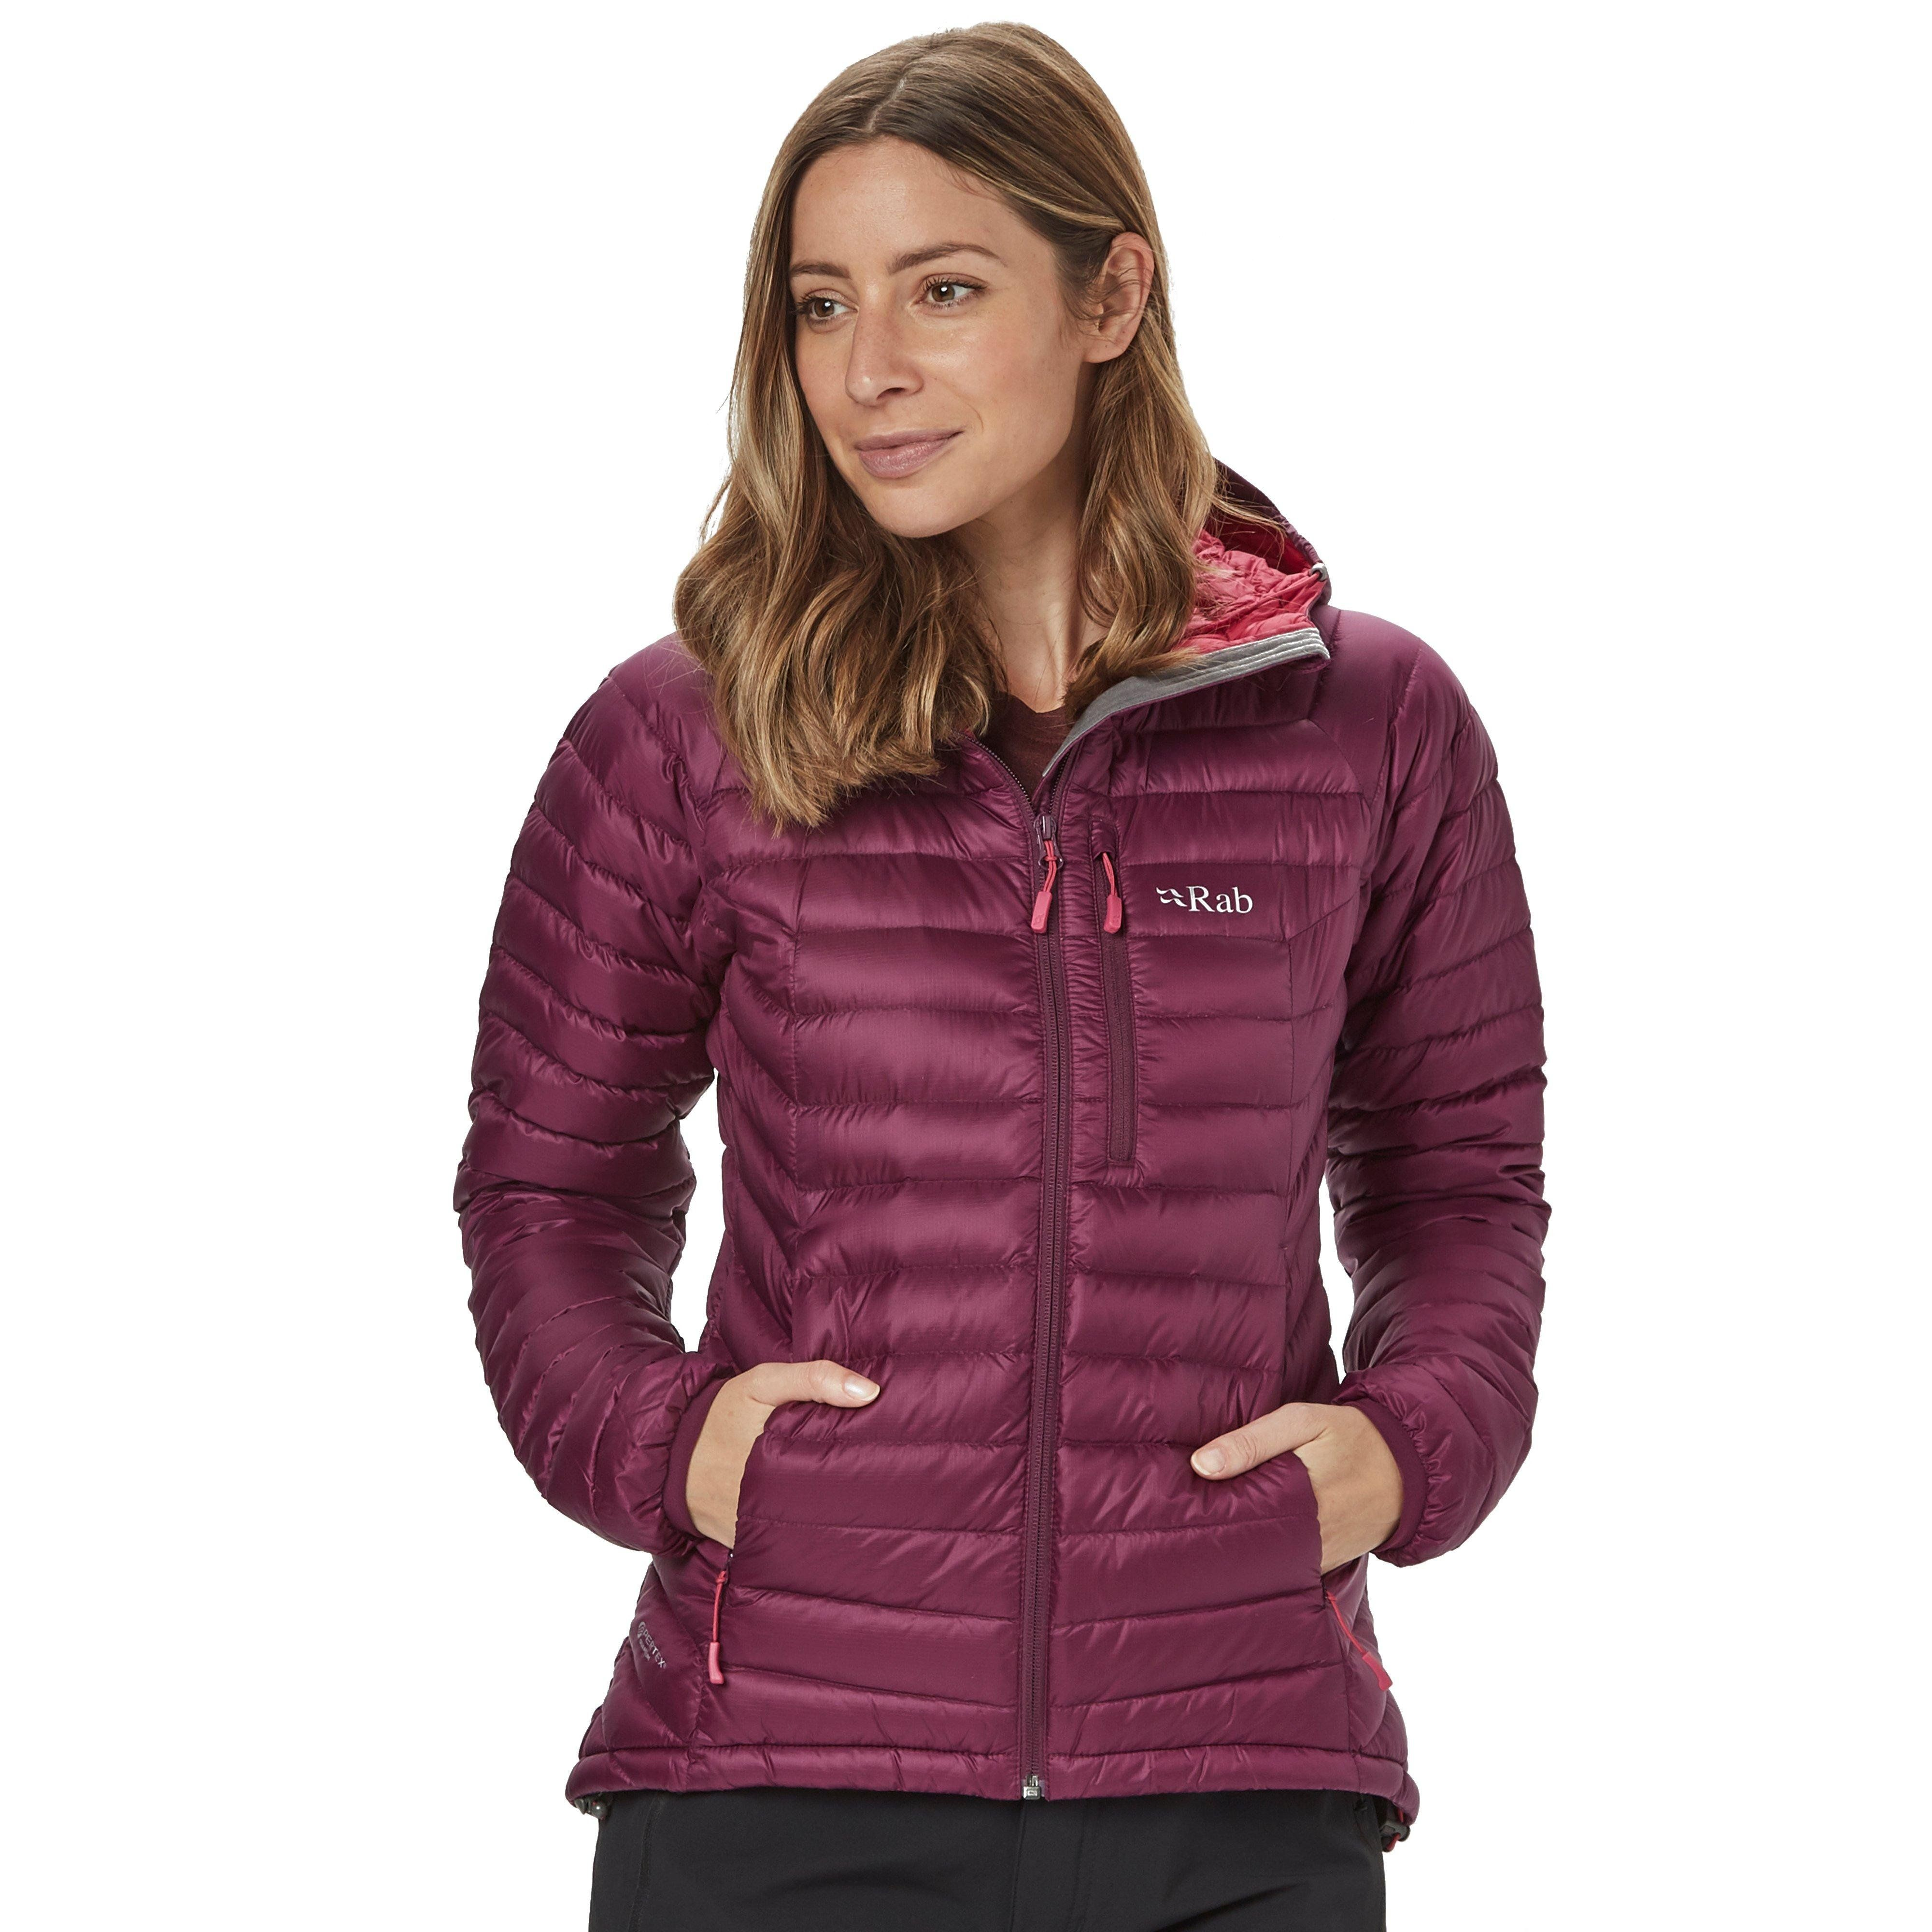 RAB Women's Microlight Alpine Down Jacket